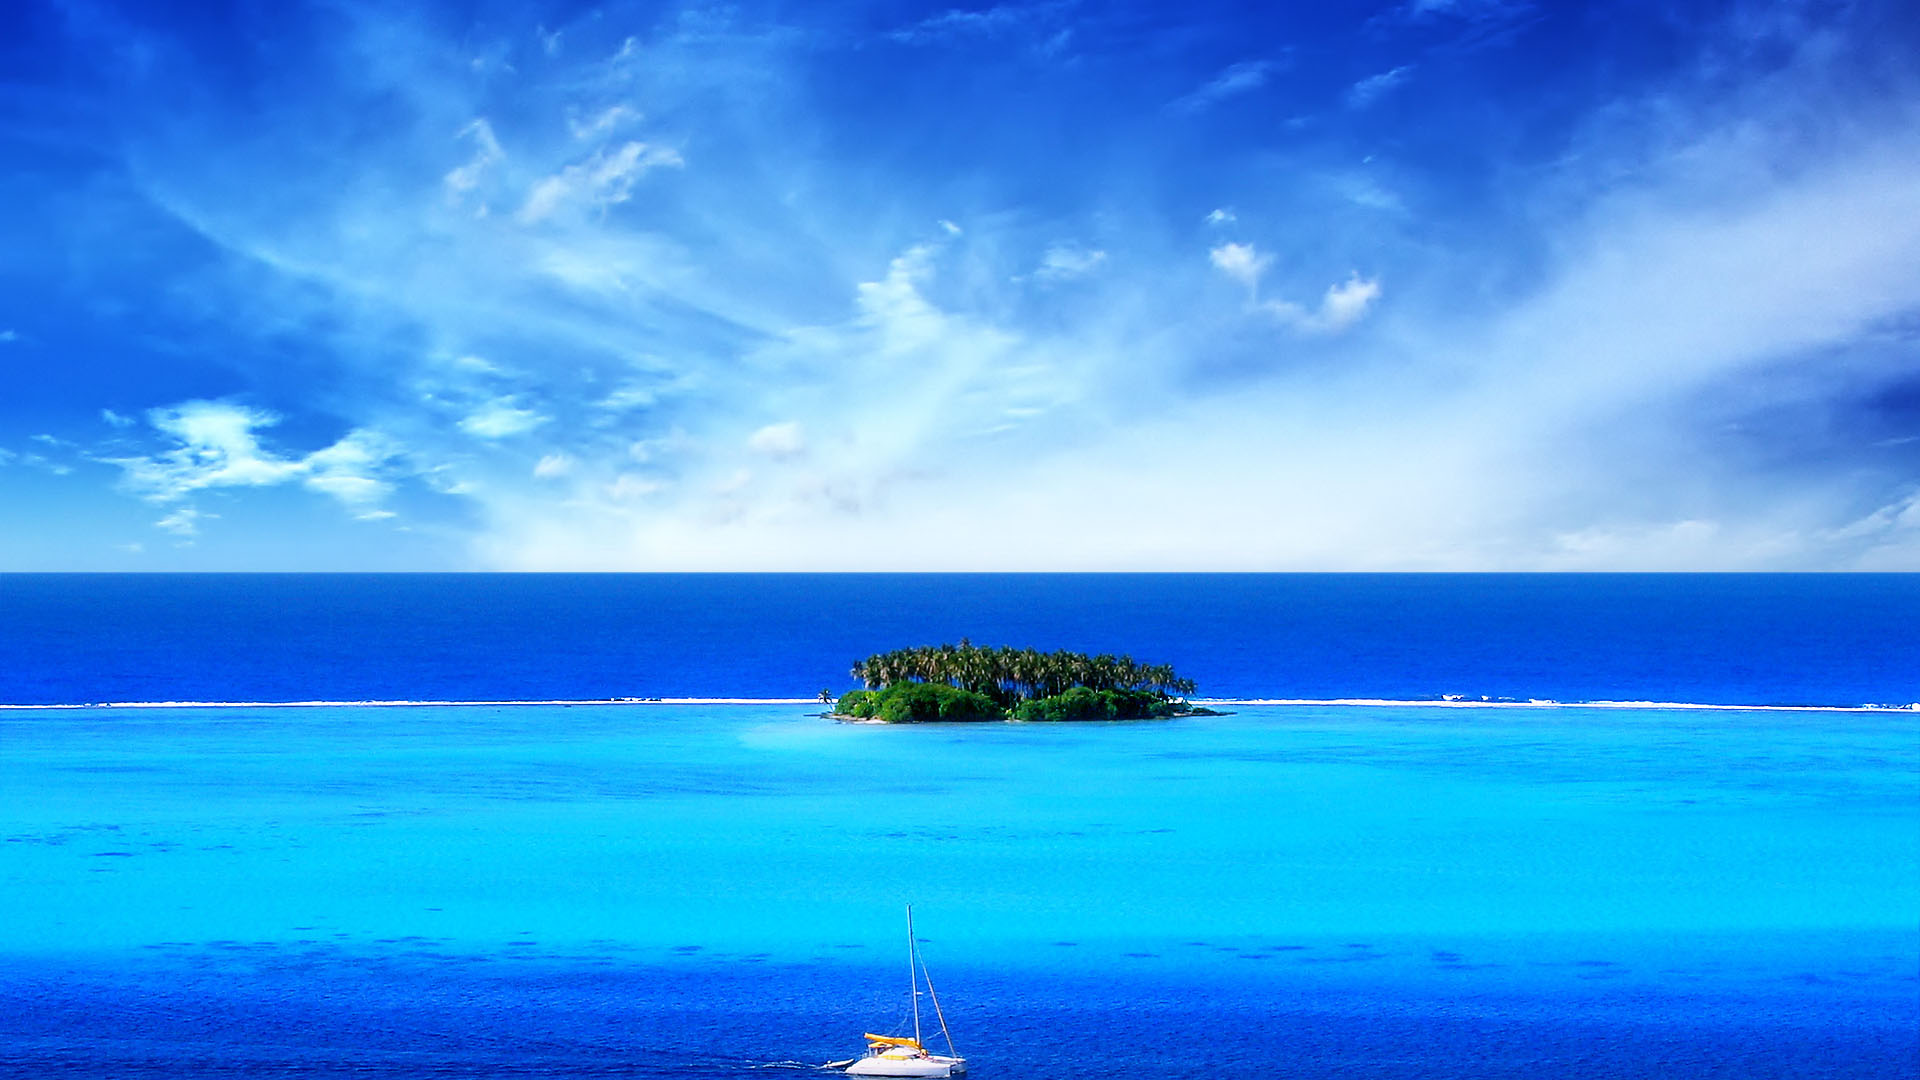 Tropical Island Wallpaper Tropical Island Wallpaper ...